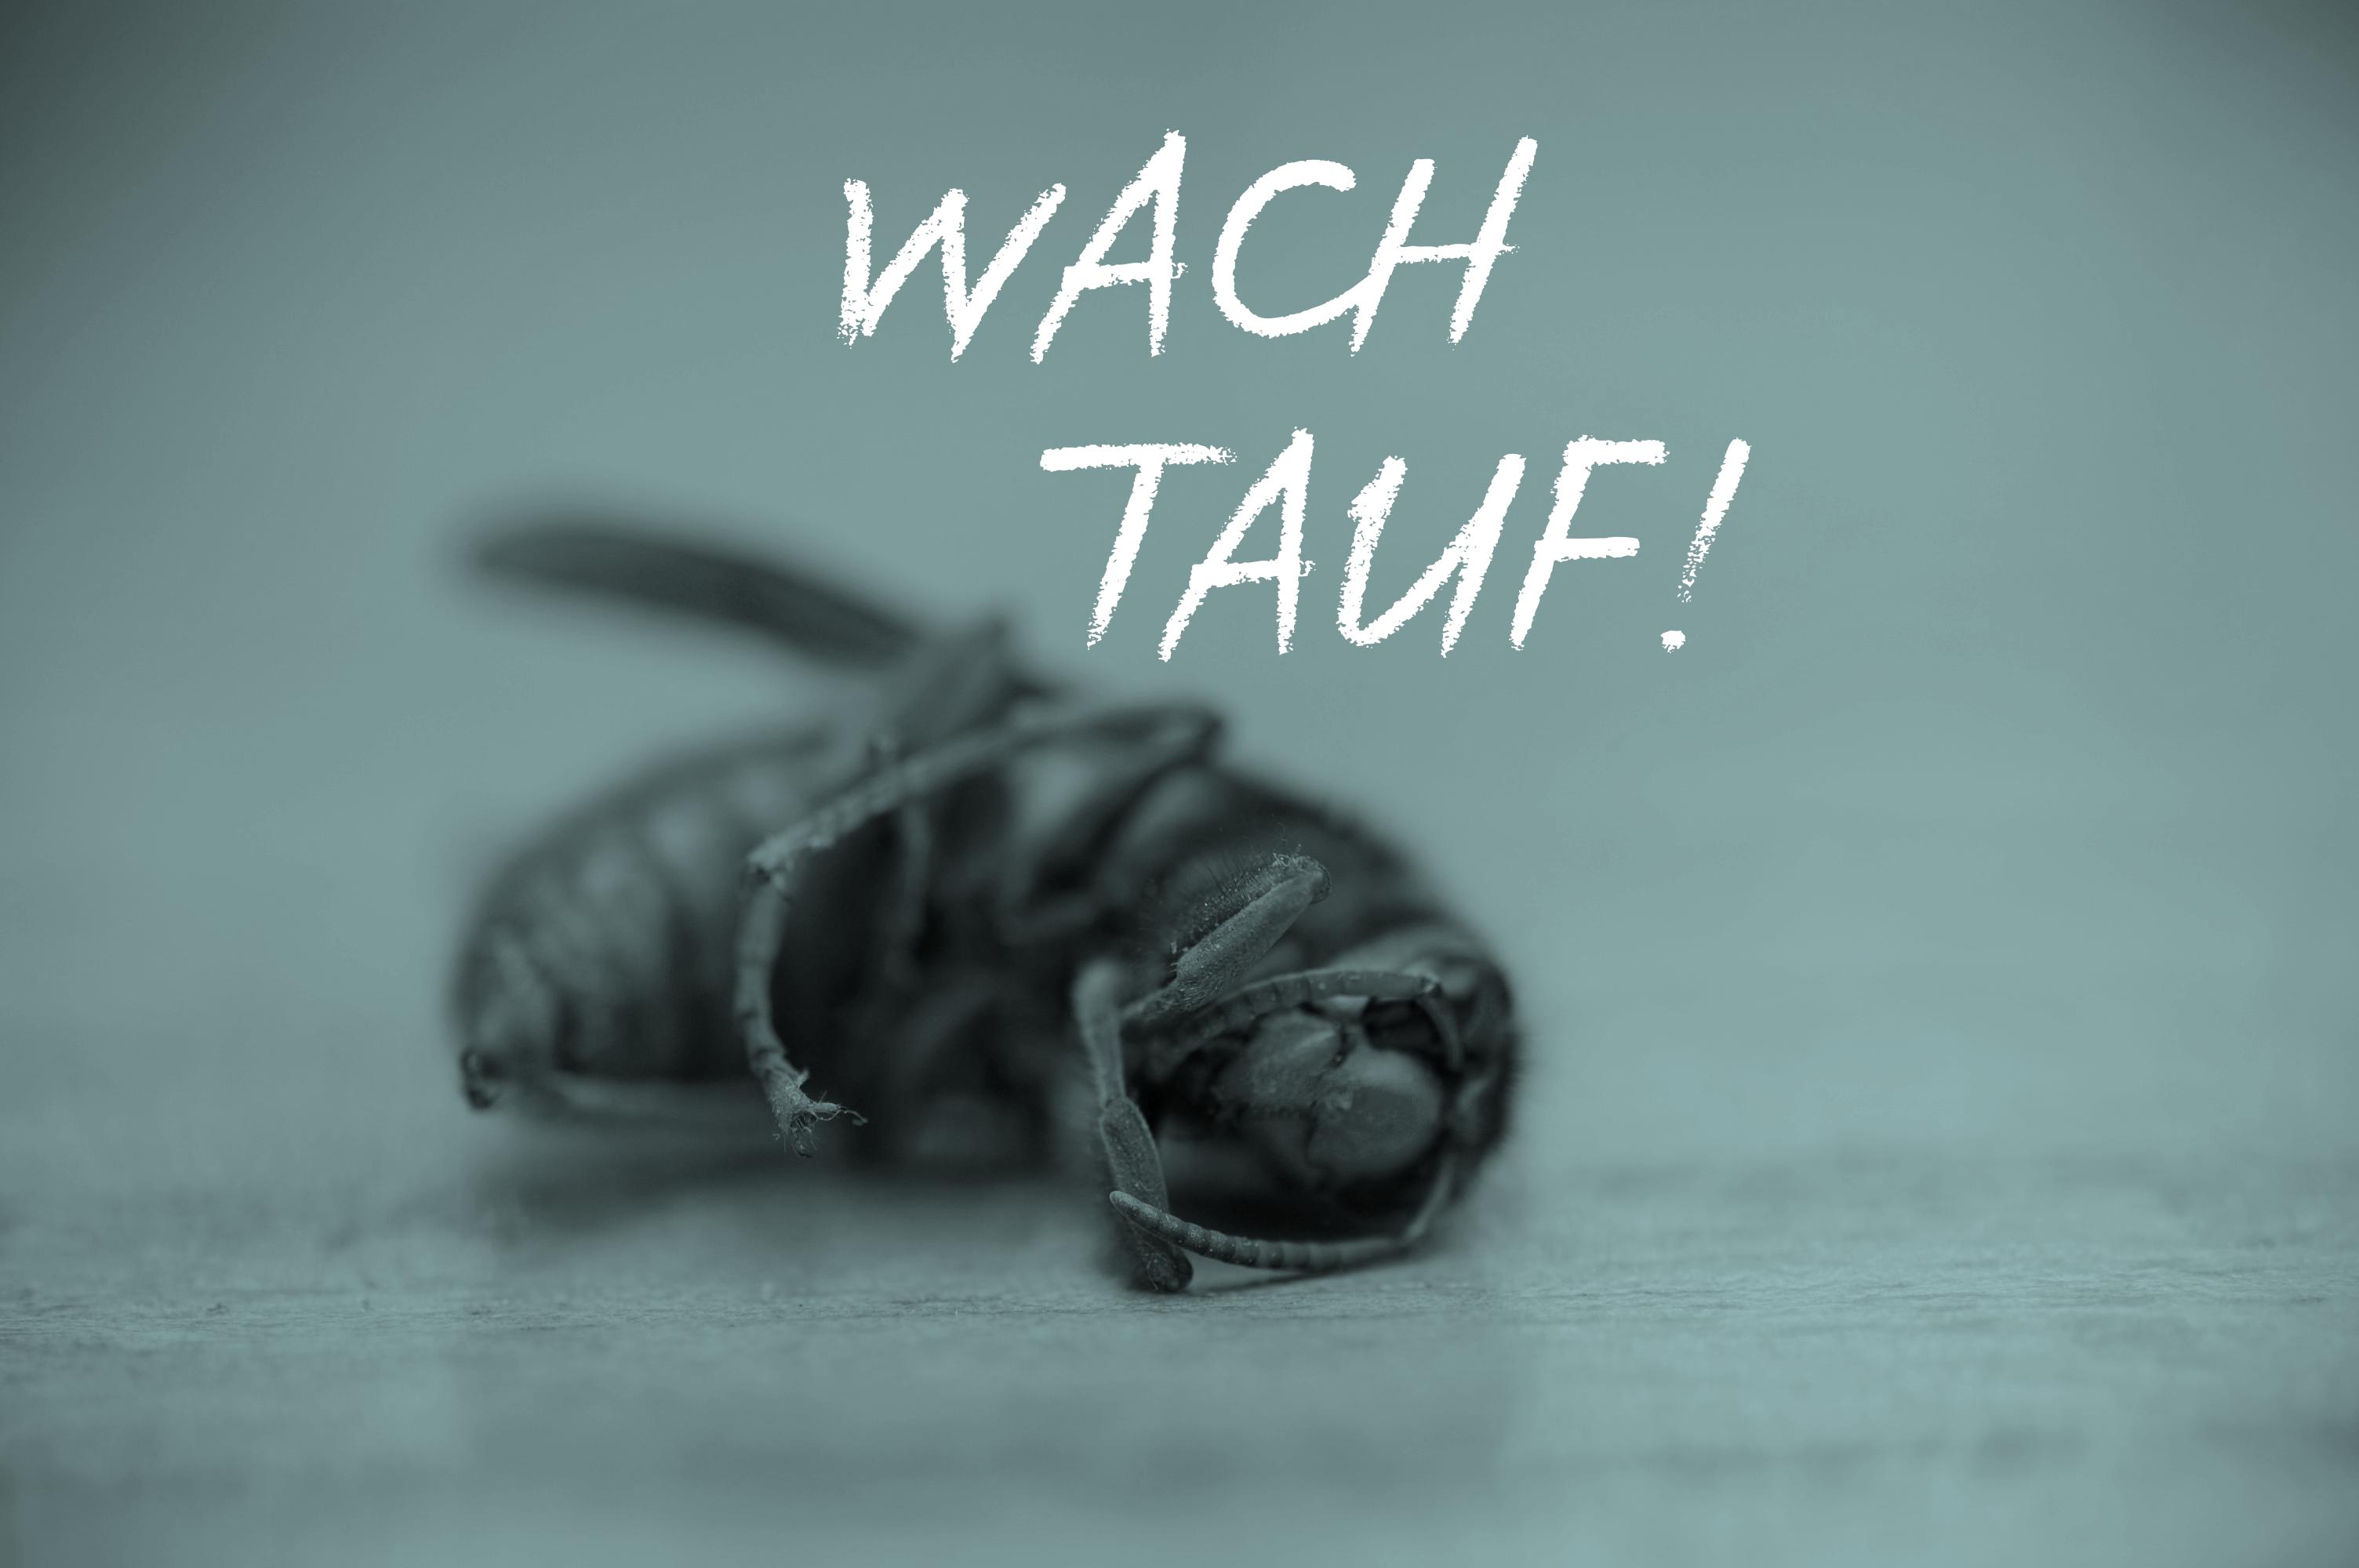 Das Insektensterben Brummt!